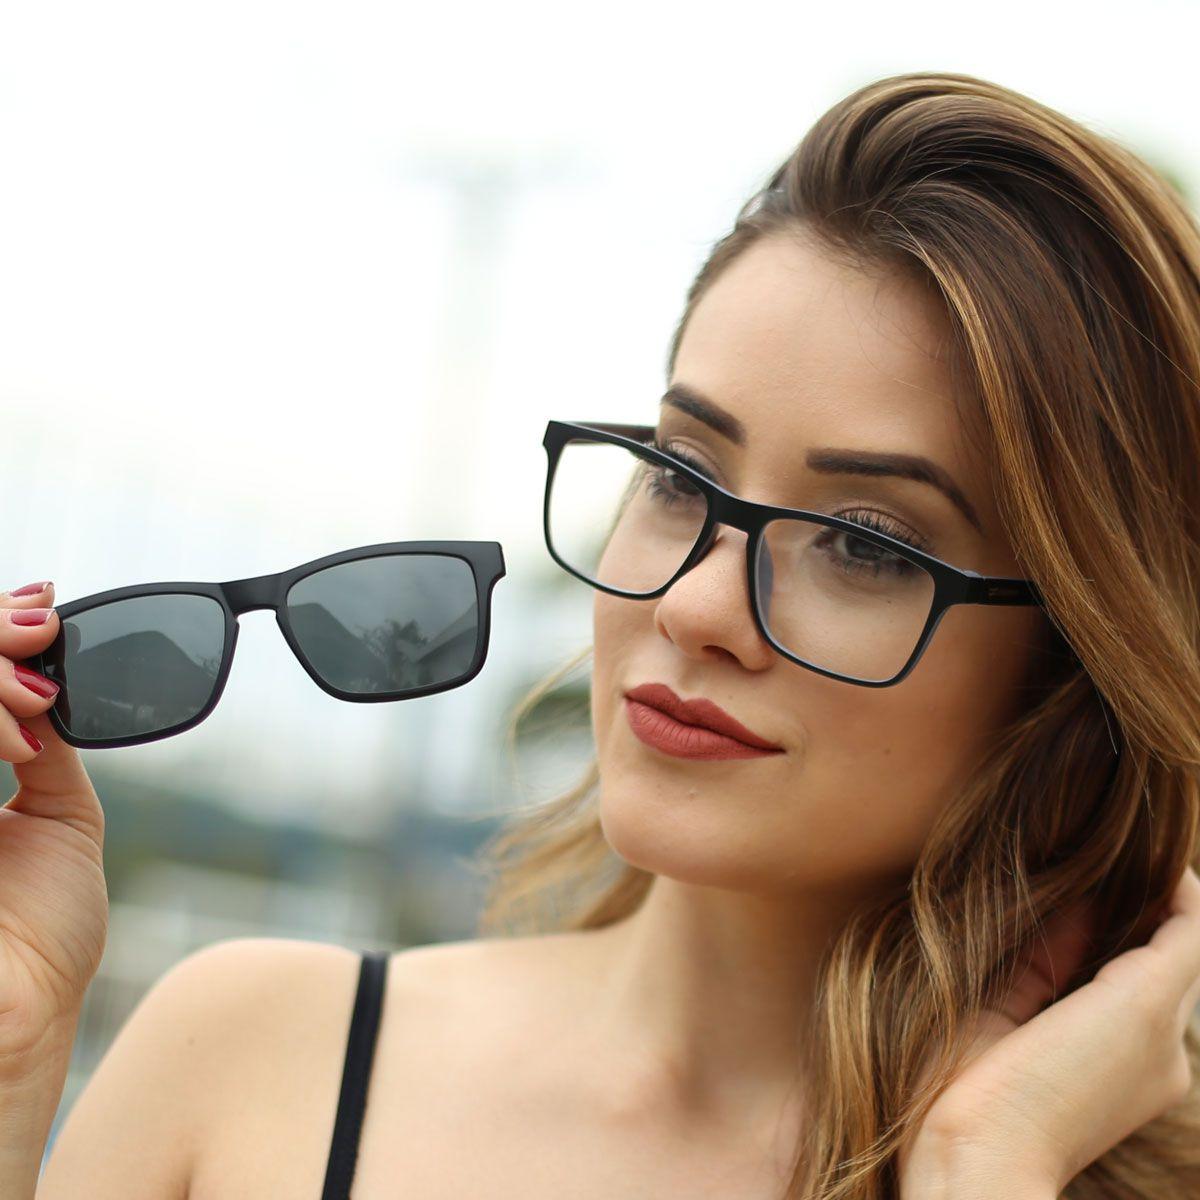 ... Armação para Óculos Díspar D1953 Clip On 1 Lente - Preto - Díspar Style  ... 62f0fc81ae